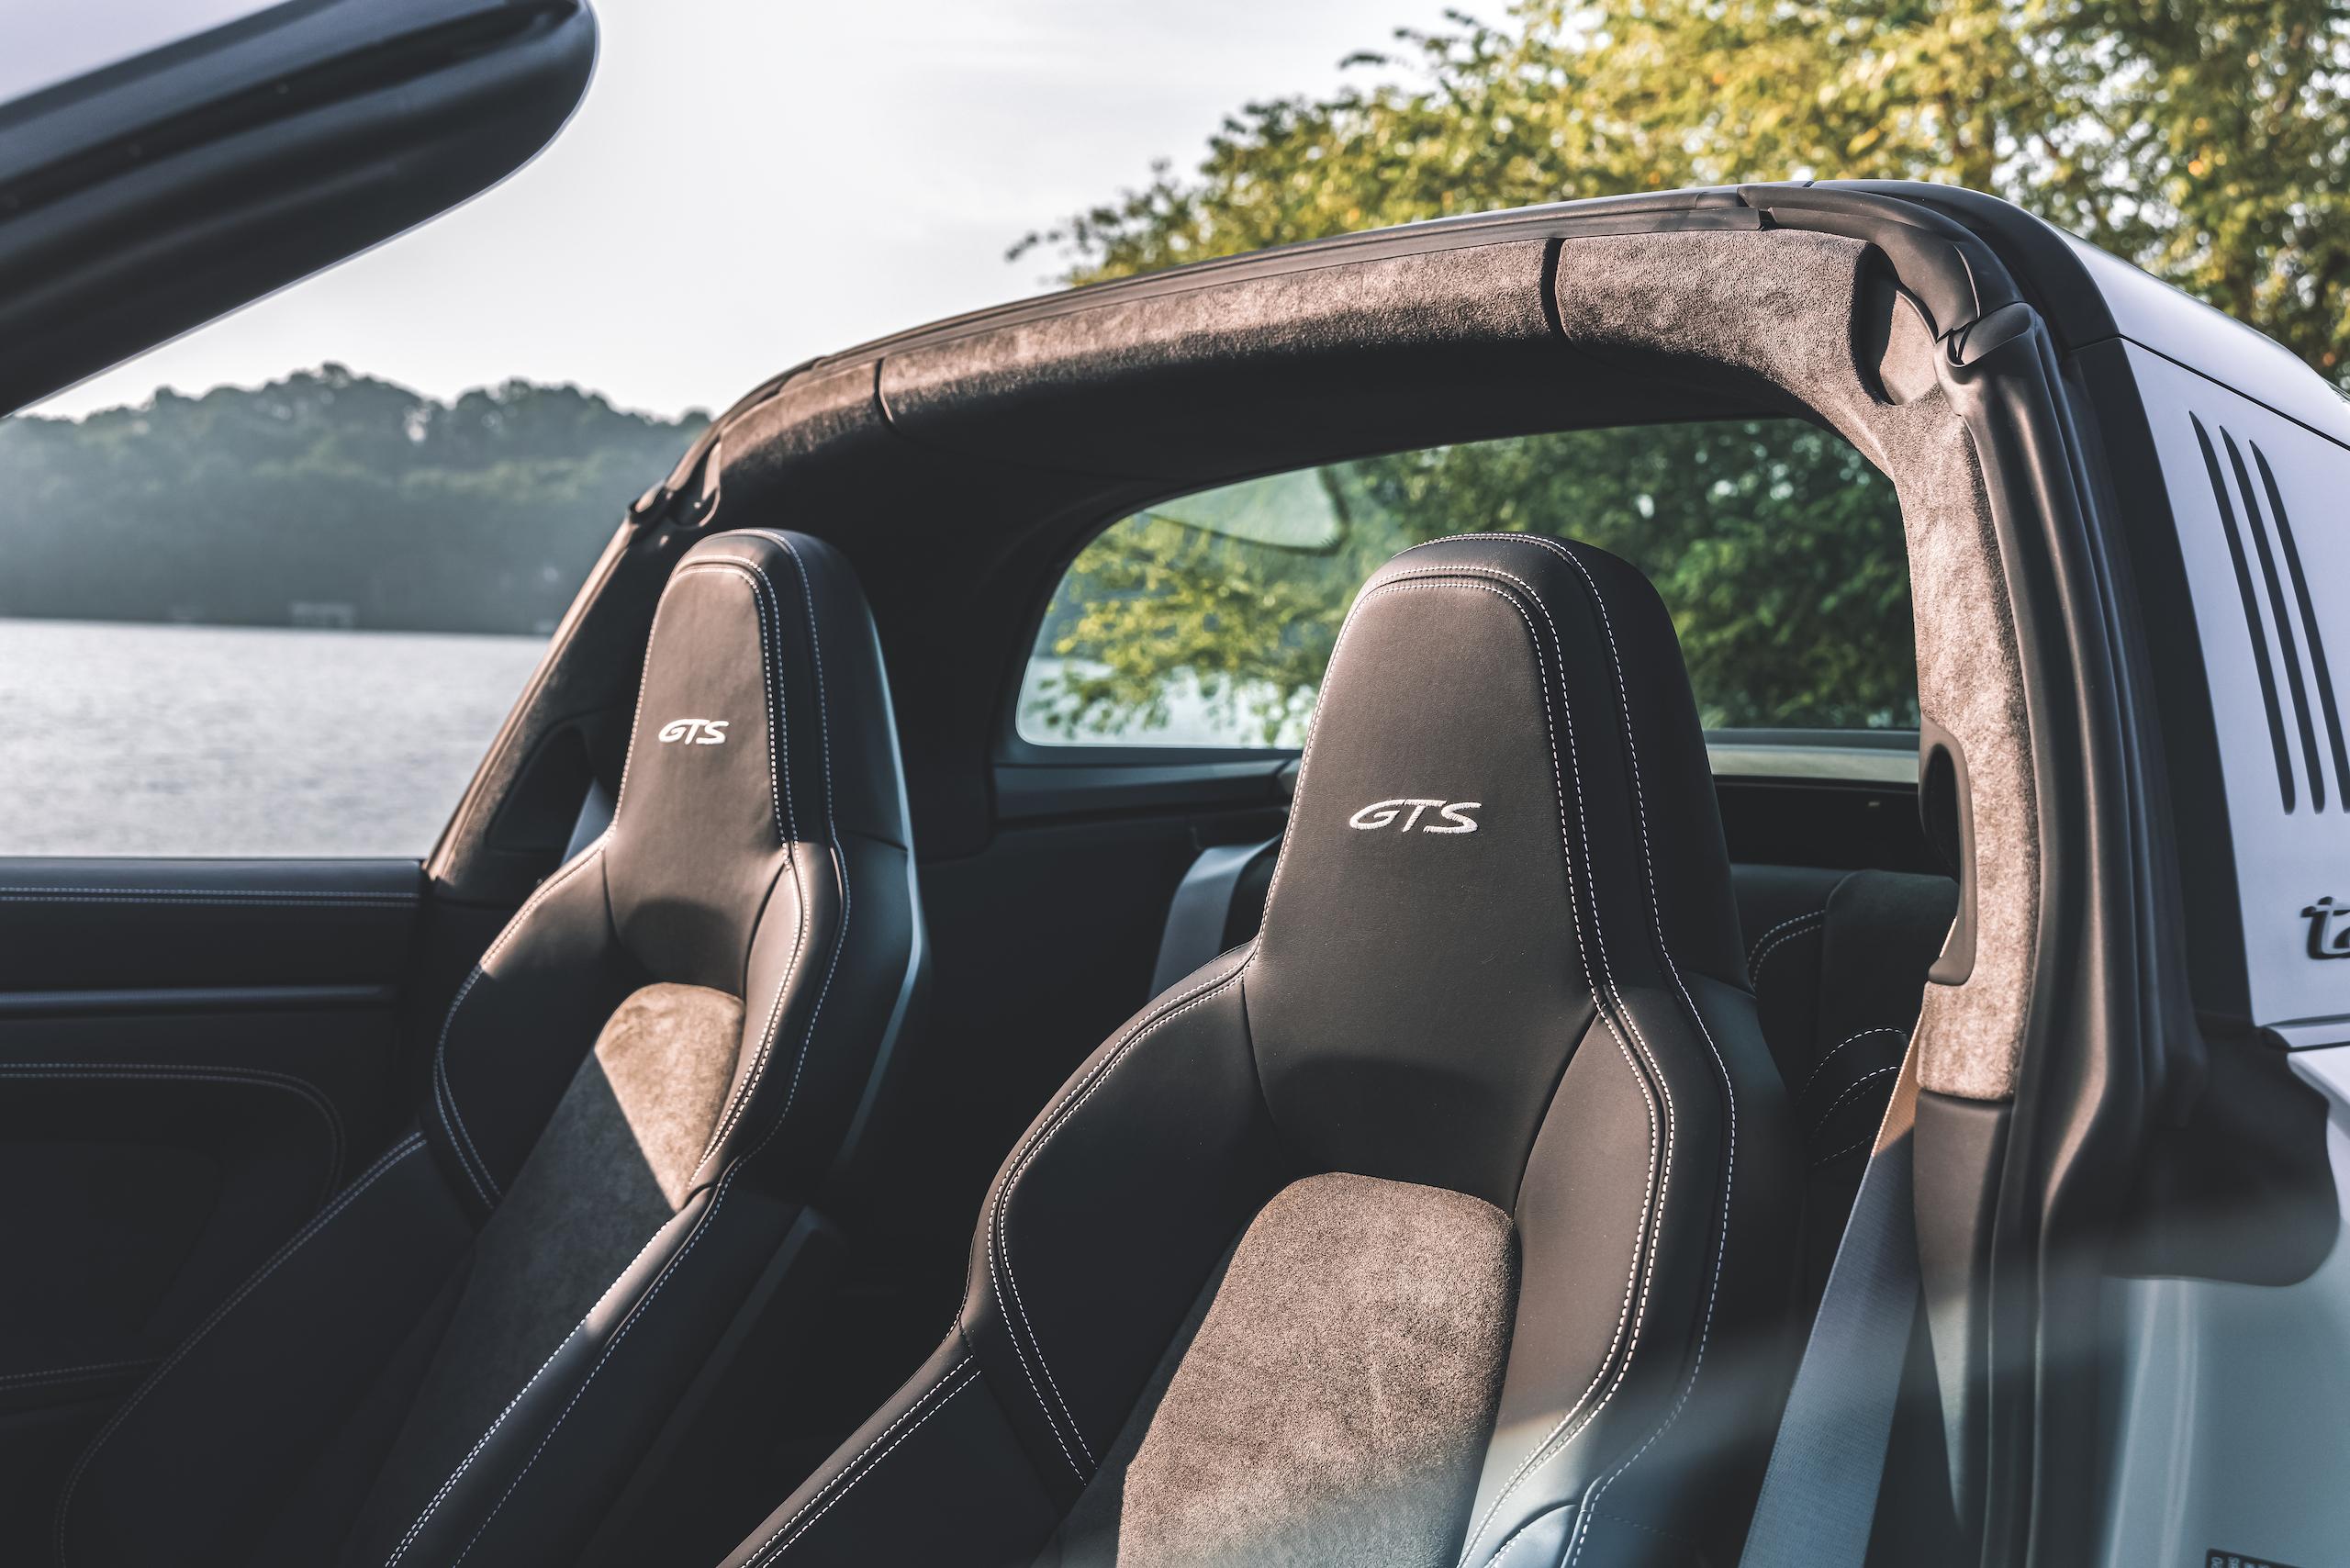 Porsche 911 Targa 4 GTS interior seats roofline